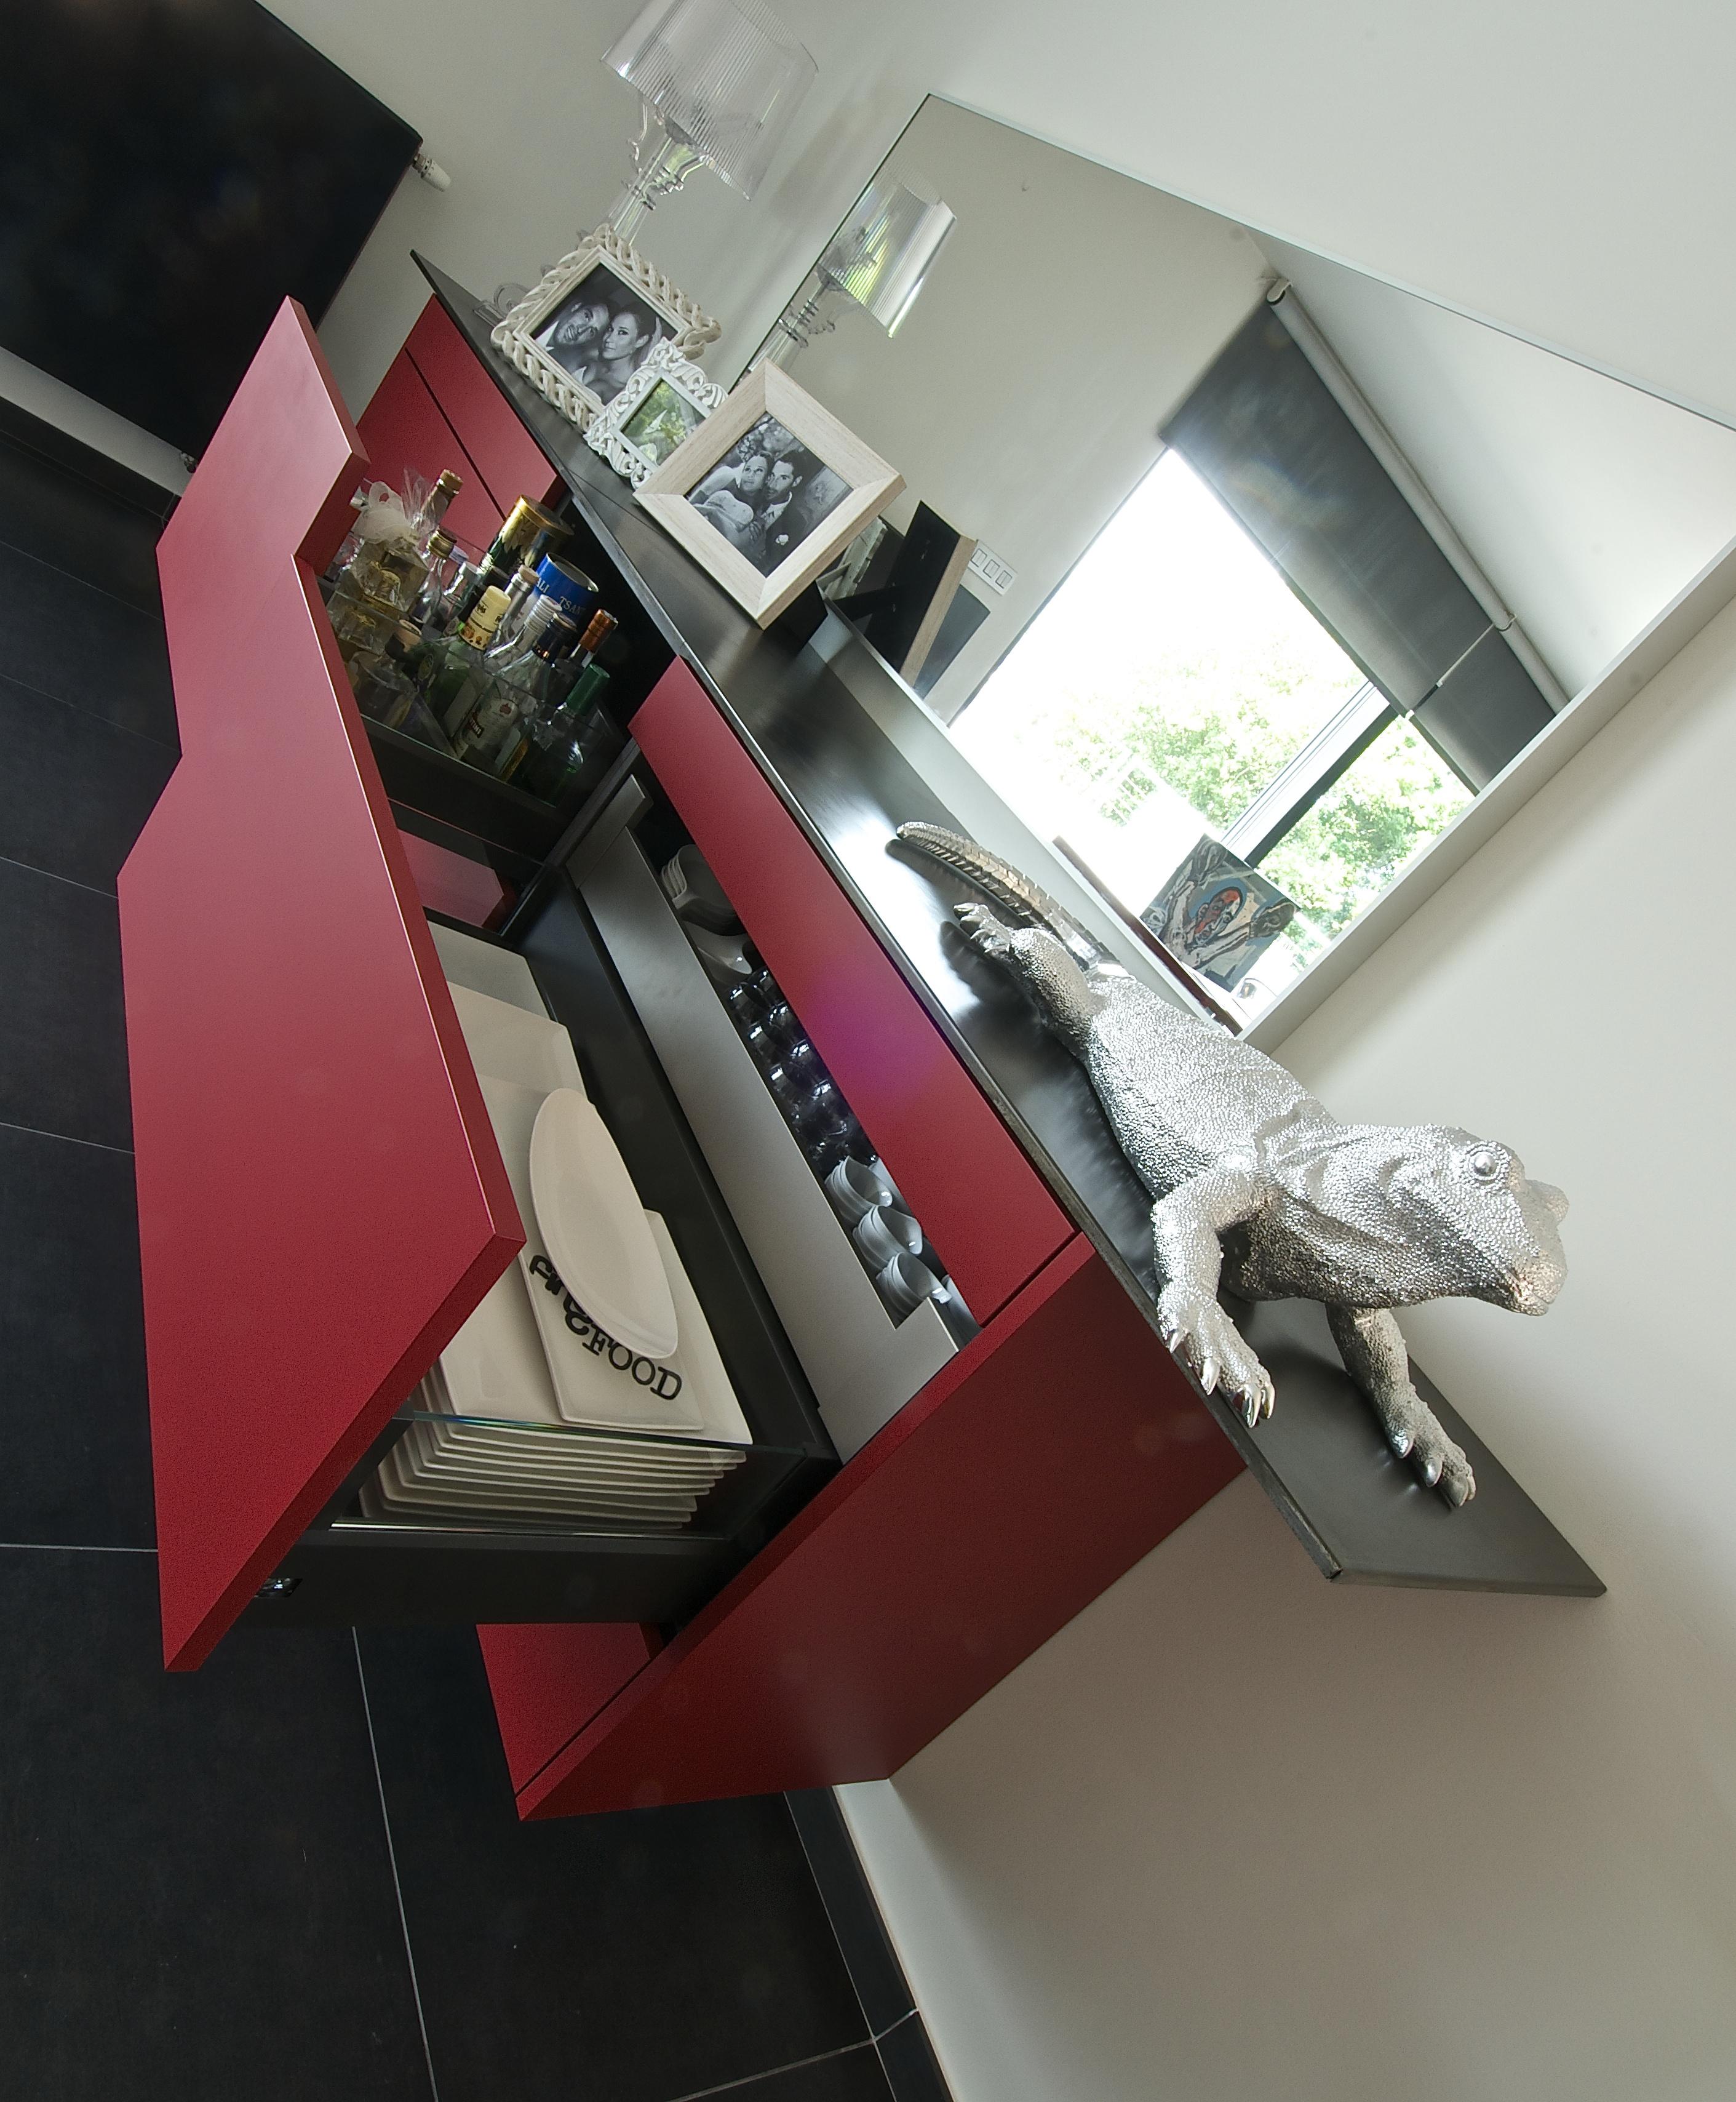 meuble sur mesure decorateur pierre wege liege pierre wege. Black Bedroom Furniture Sets. Home Design Ideas